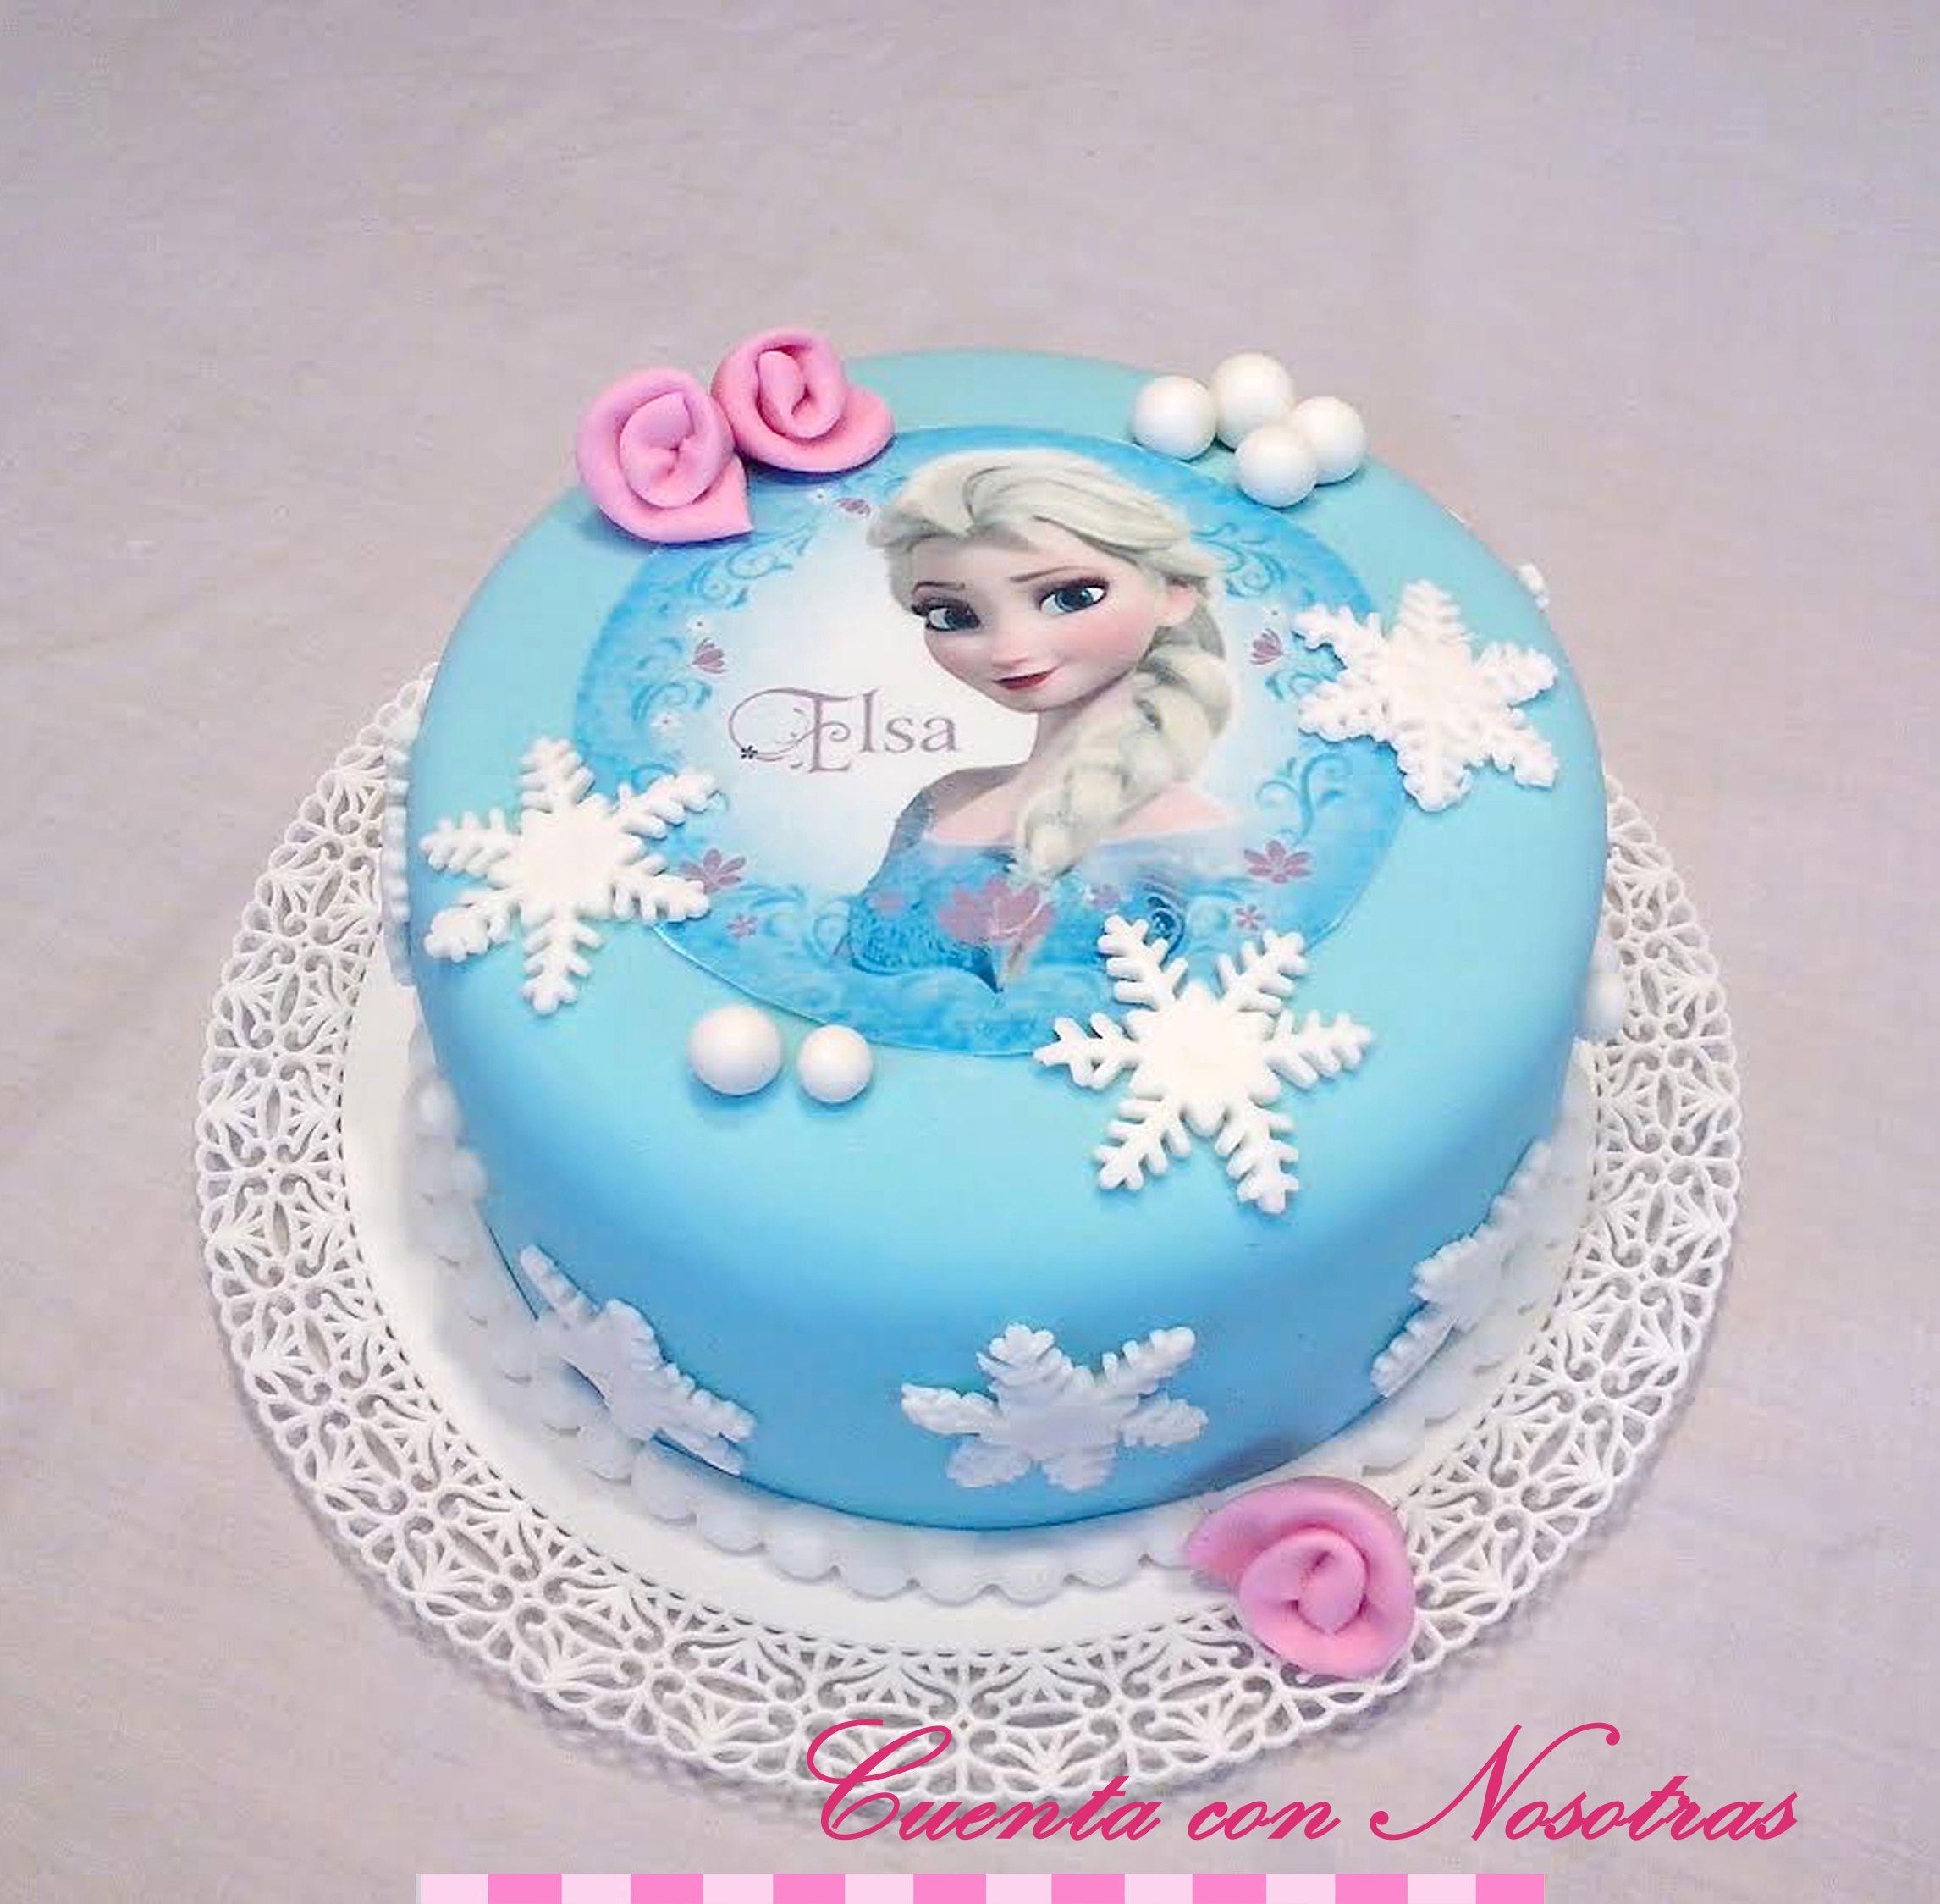 Surprising Torta Frozen Torta Elsa Frozen Cake With Images Frozen Personalised Birthday Cards Epsylily Jamesorg